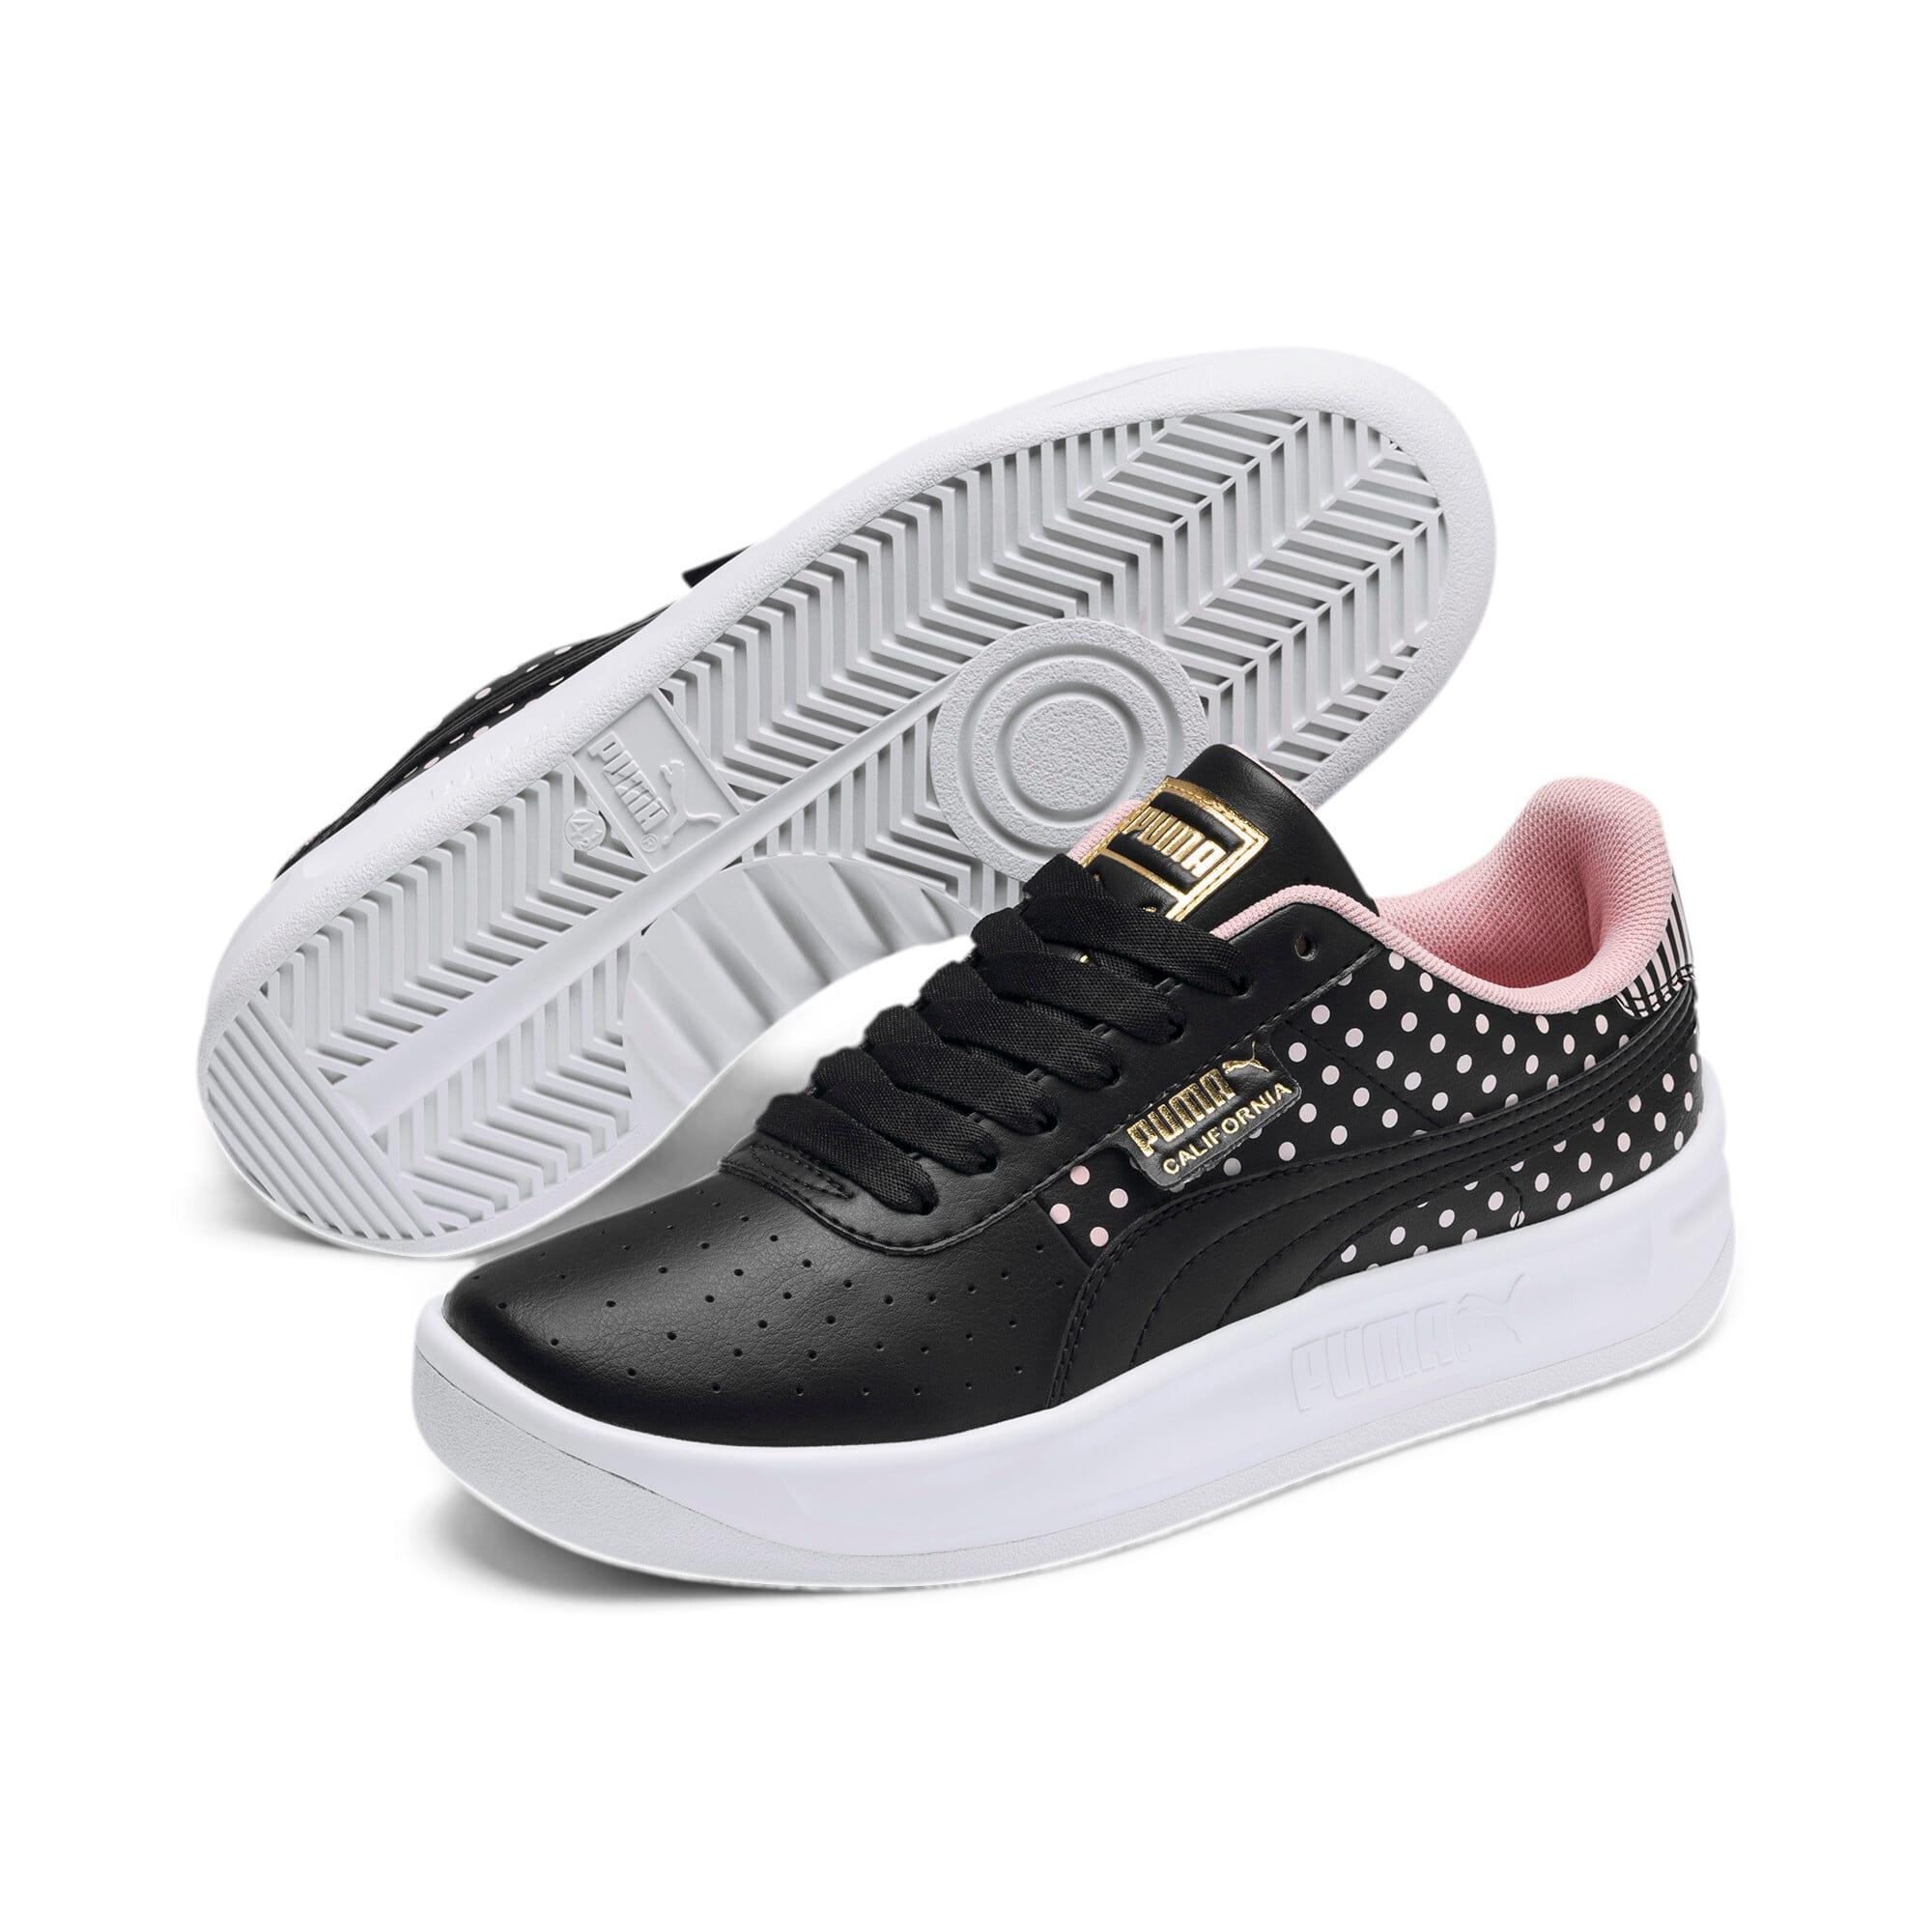 Thumbnail 2 of California Remix Women's Sneakers, Puma Black-Bridal Rose, medium